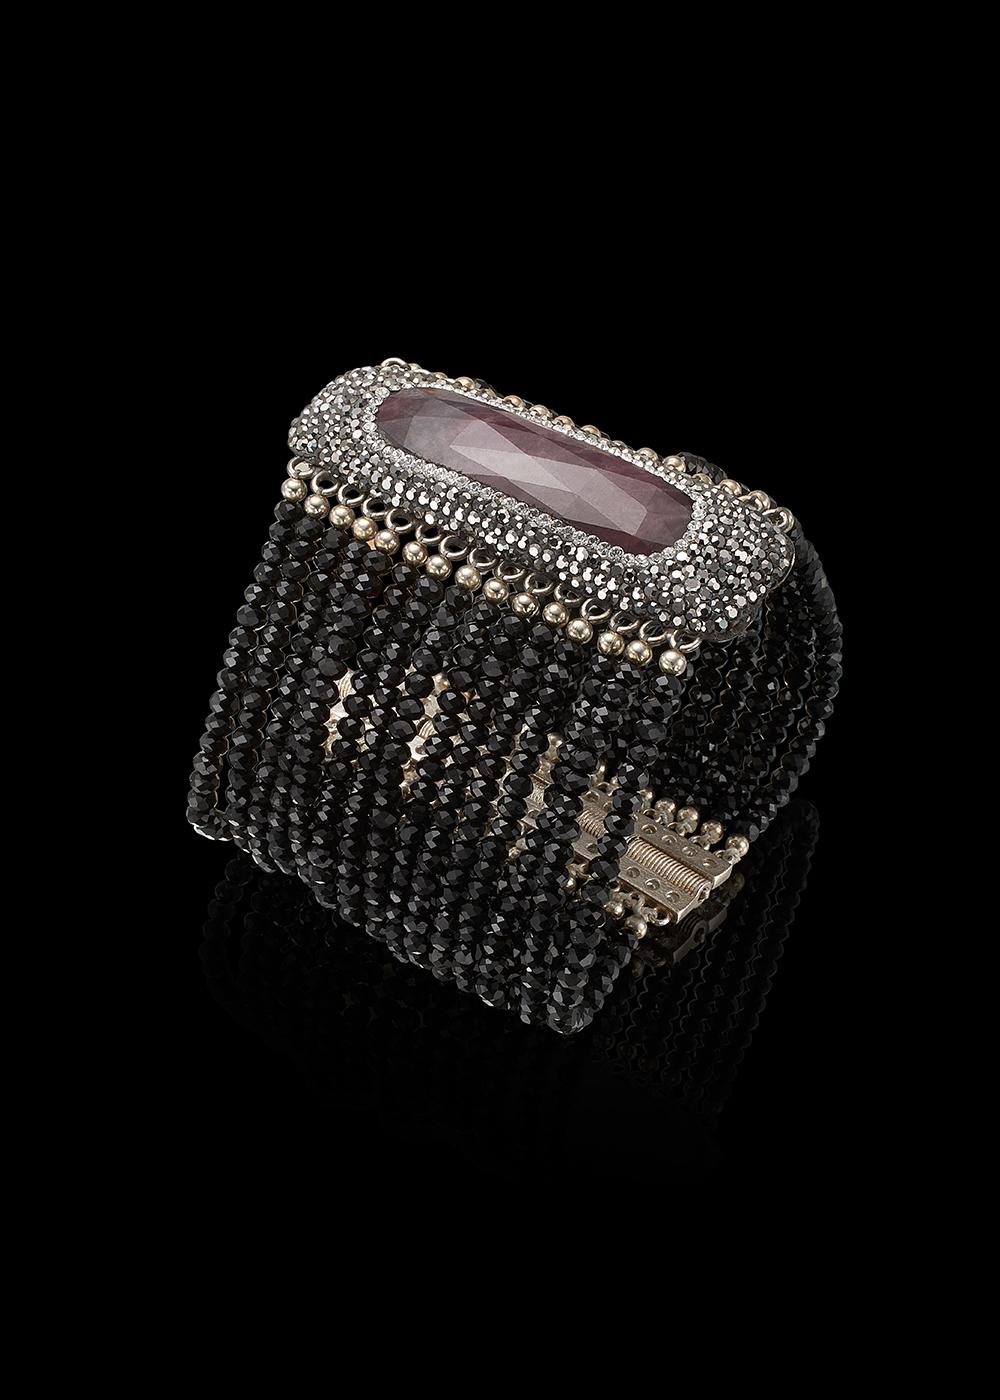 TACOMA bracelet with Tourmaline and Swarowski Crystals